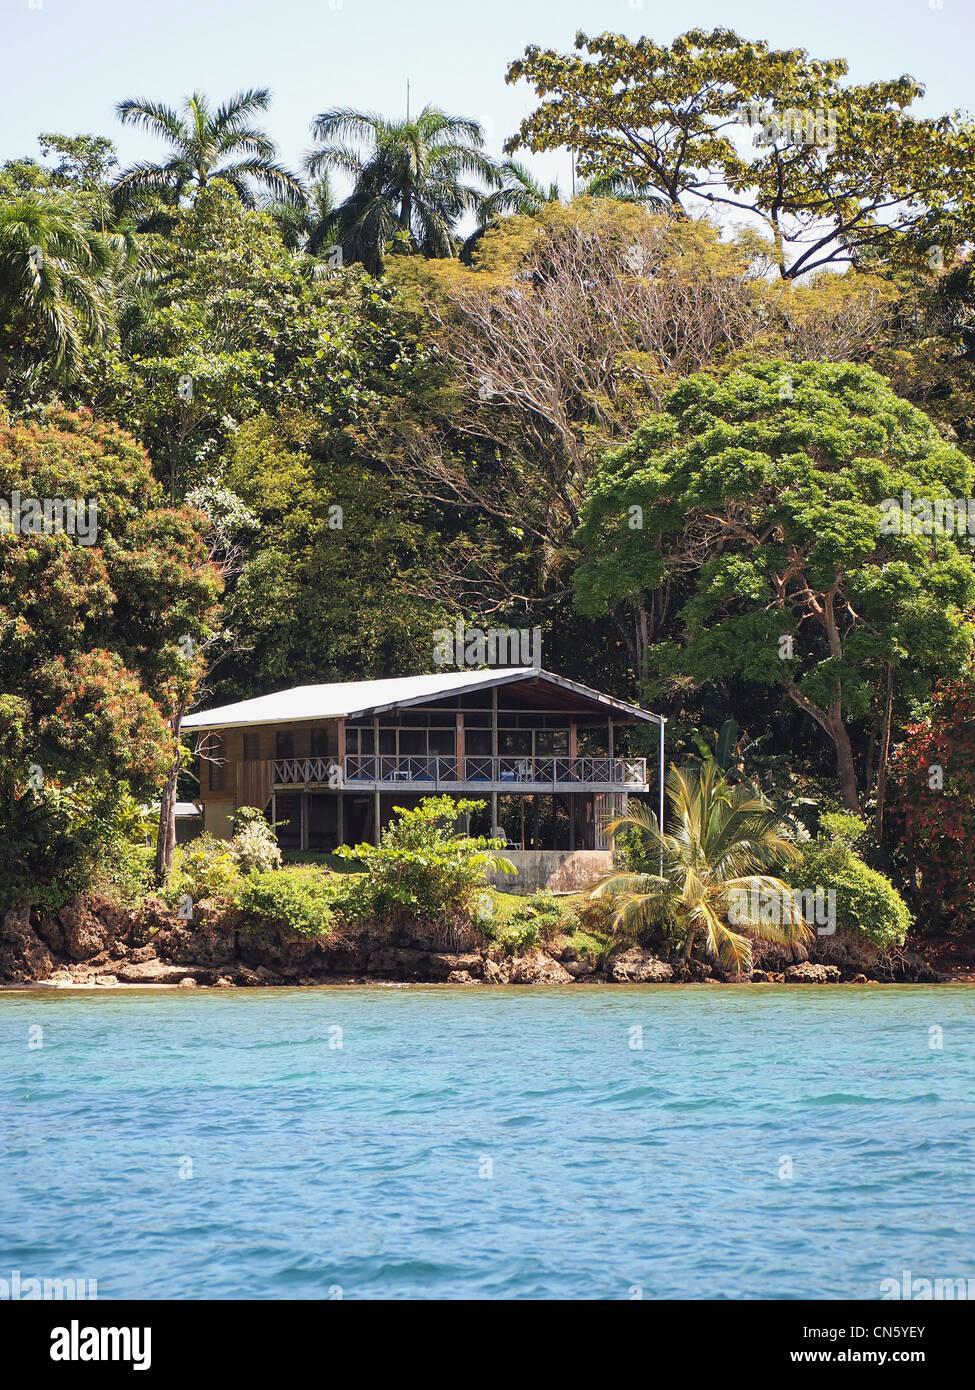 Waterfront Karibik Haus umgeben von üppiger tropischer Vegetation, Bocas del Toro, Panama Stockbild